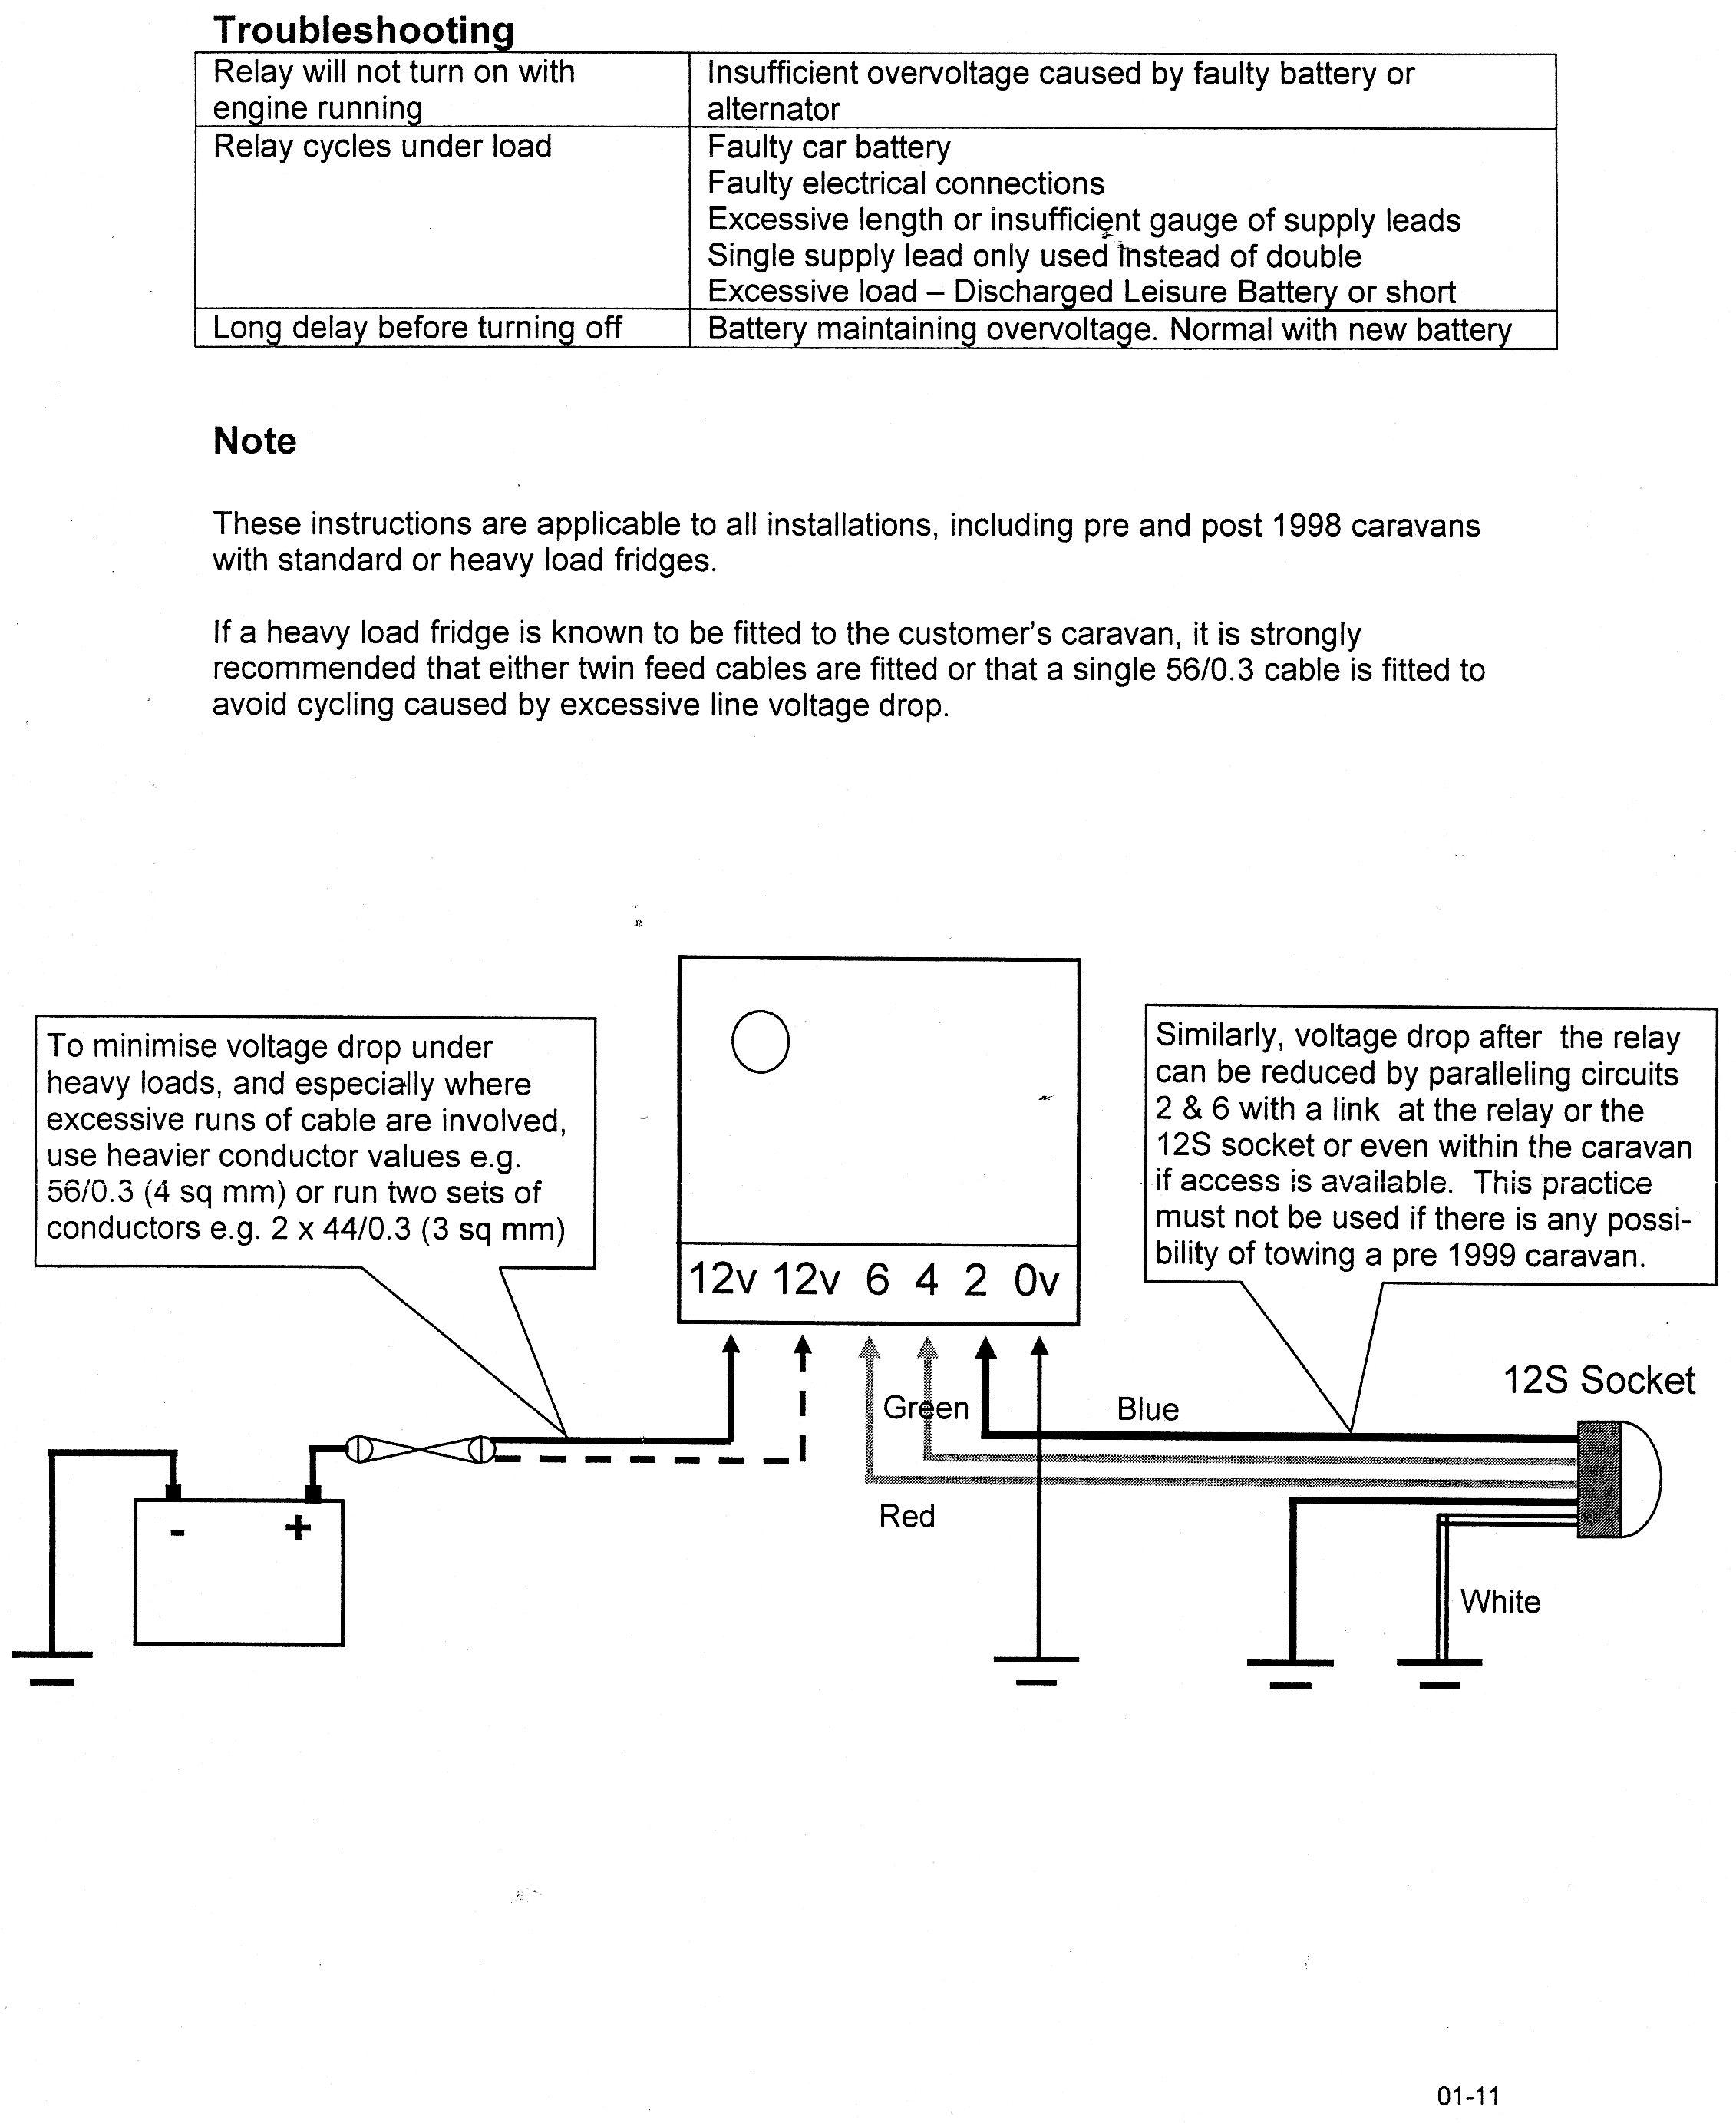 bypass relay wiring diagram mv 3517  smartcom relay wiring diagram wiring schematics and diagrams  smartcom relay wiring diagram wiring